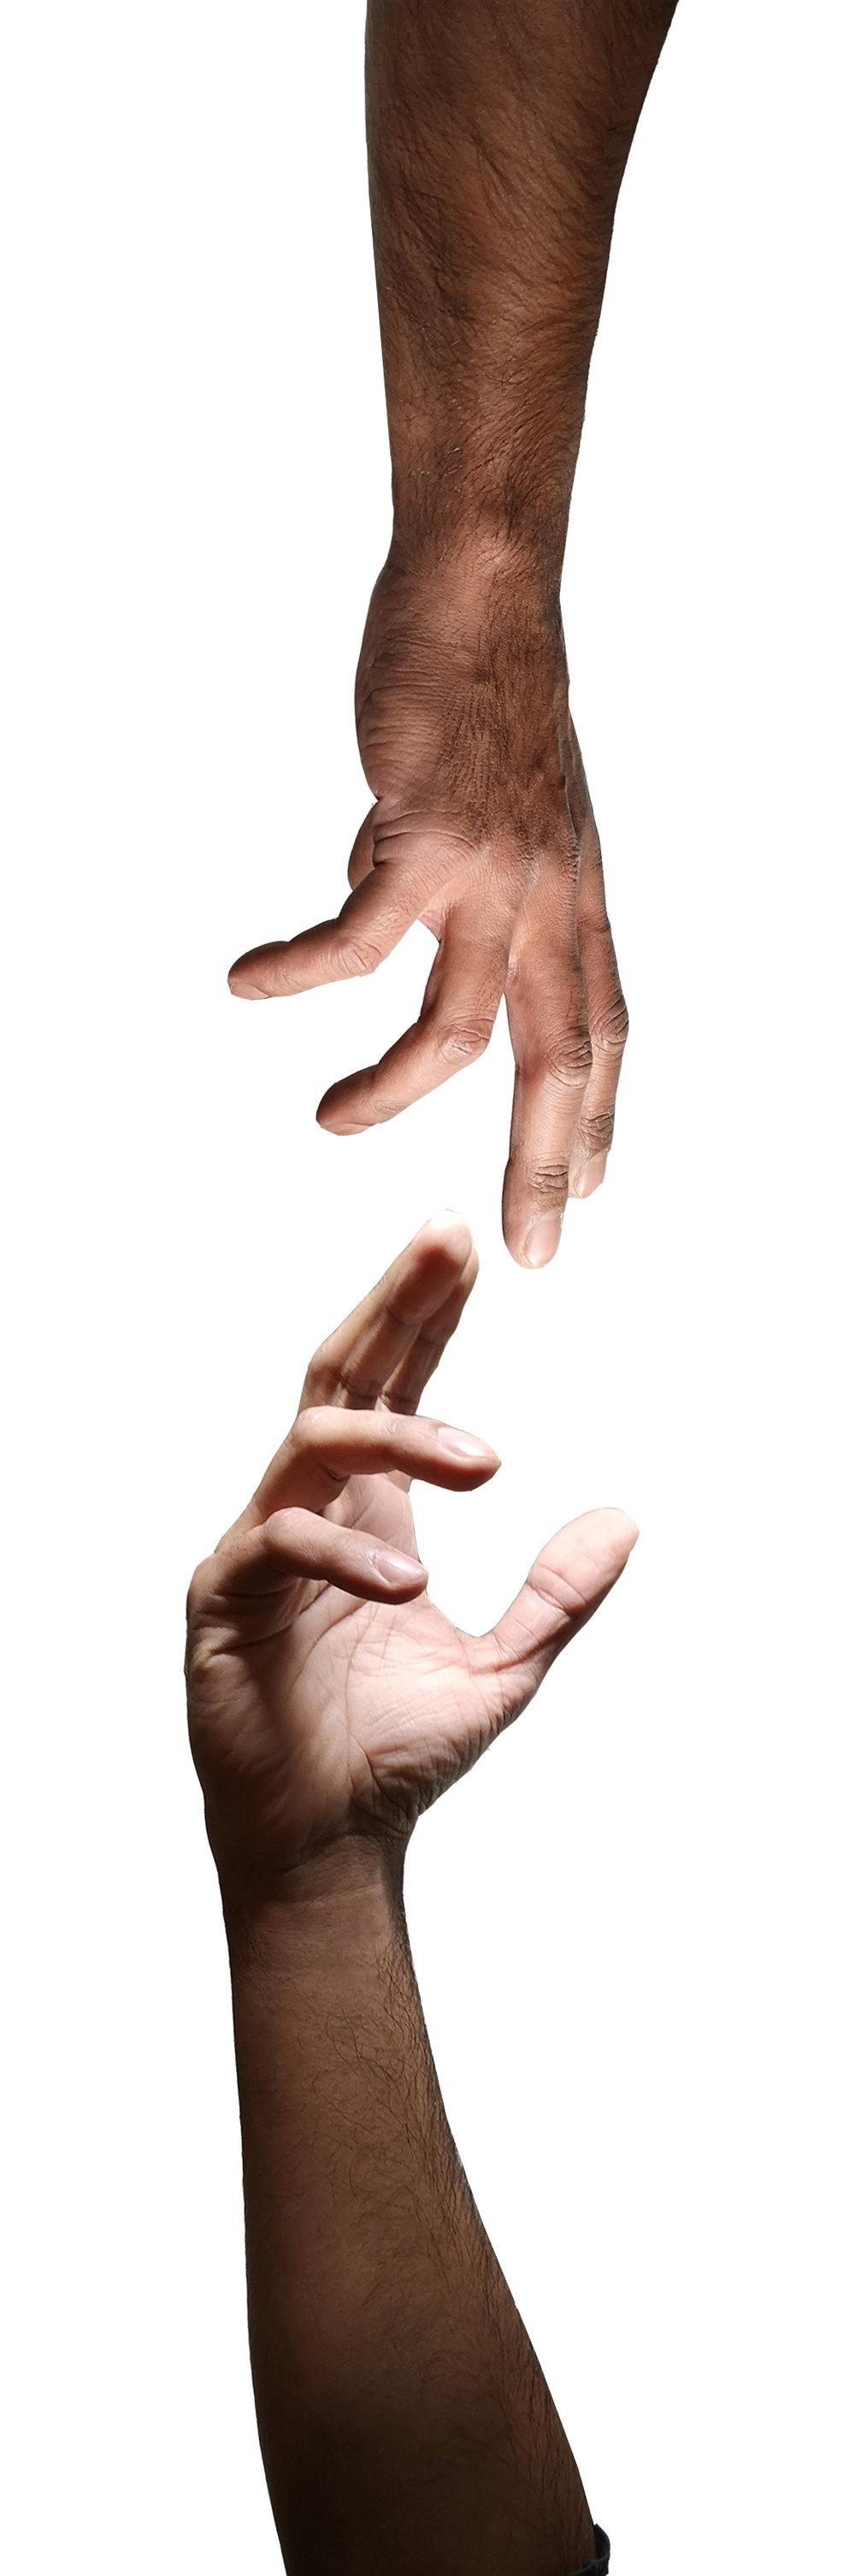 reaching hands crop.jpg